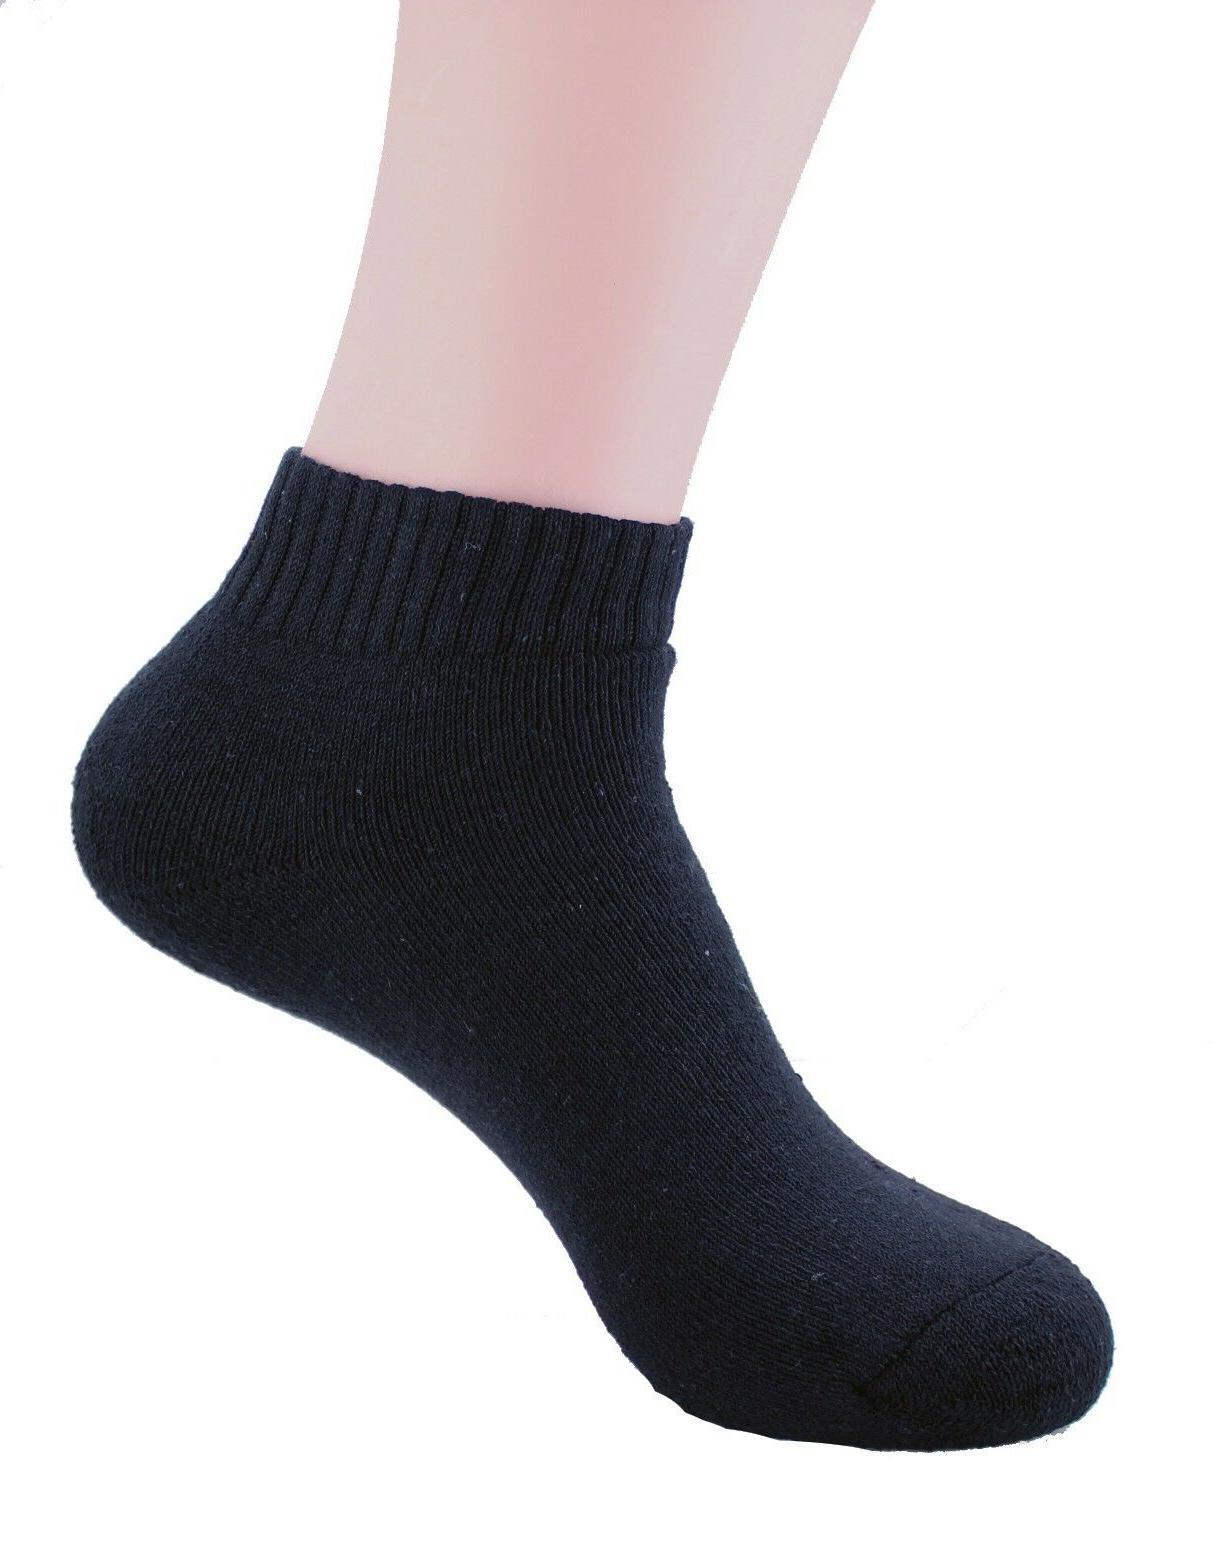 New 3-12 Pairs Black Ankle Quarter Socks Cotton Sports Low Cut